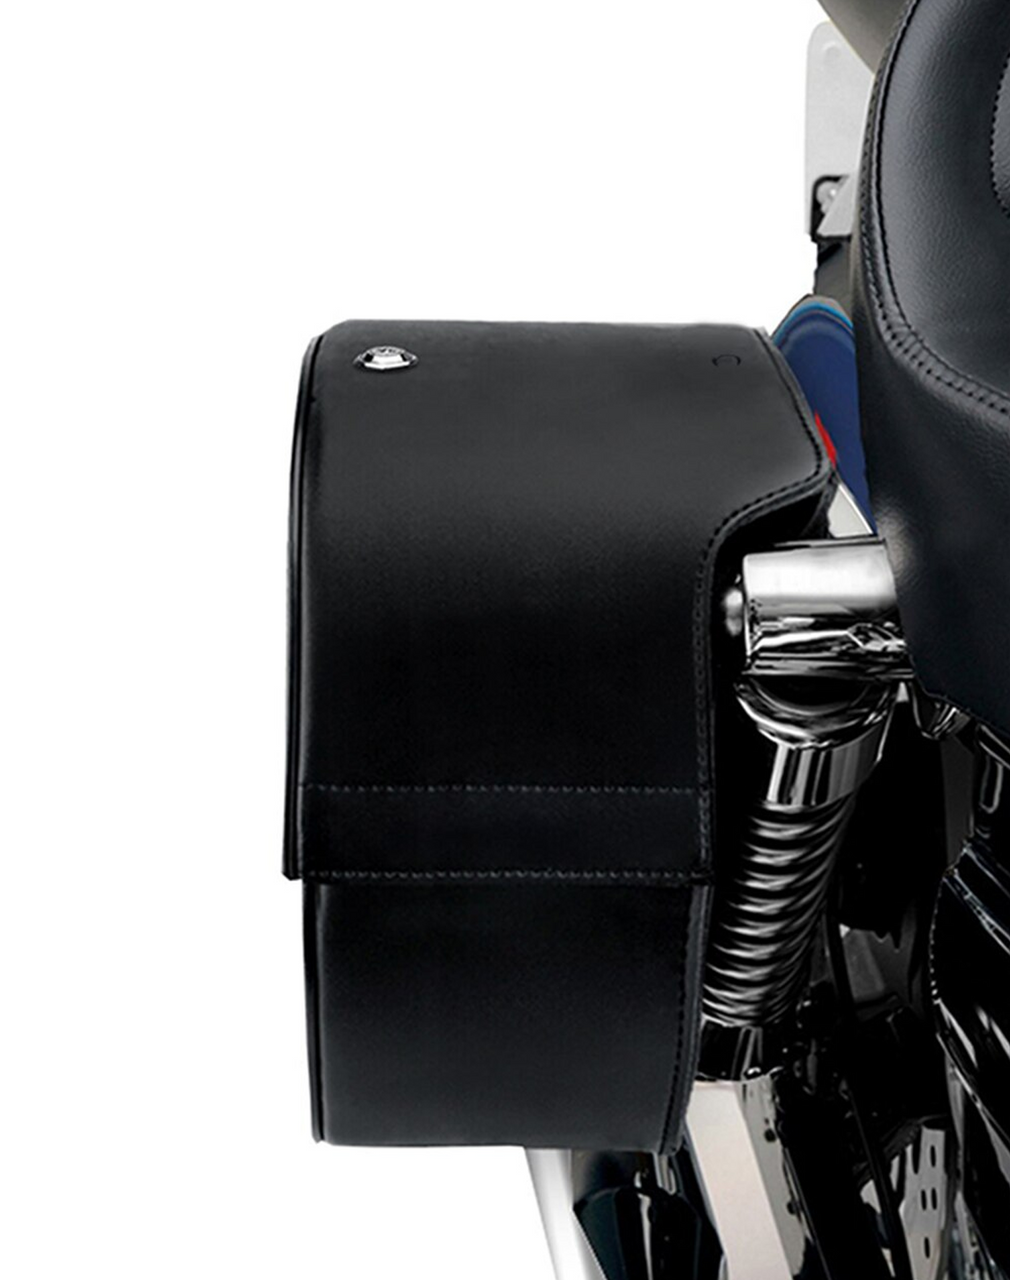 Kawasaki 1600 Mean Streak Shock Cutout Slanted Studded SS Large Motorcycle Saddlebags Shock Cutout View